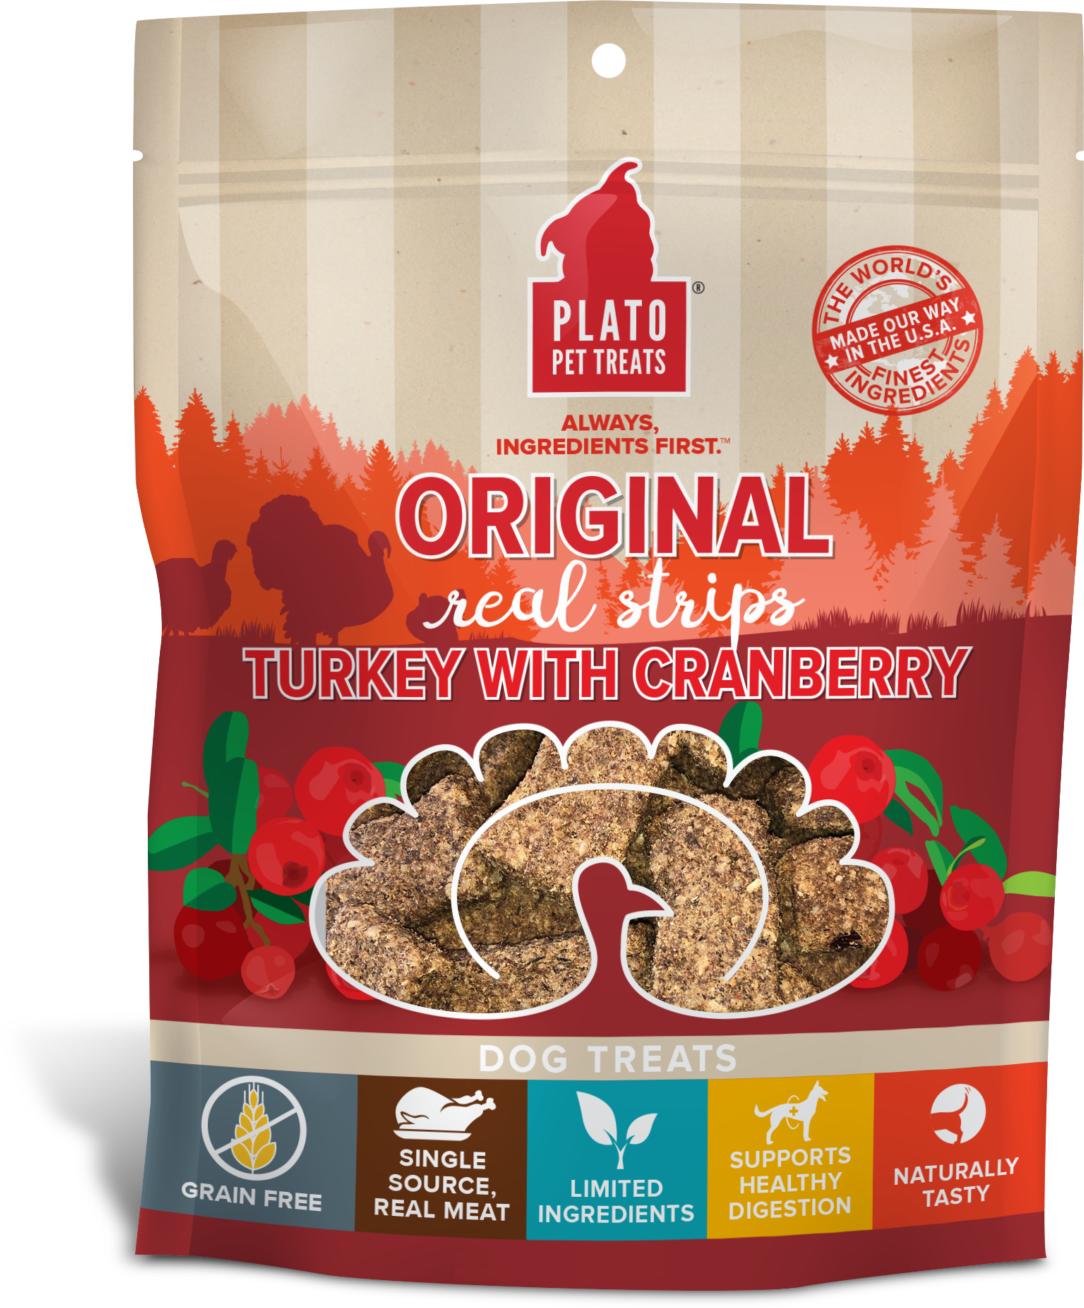 Plato Original Real Strips Turkey With Cranberry Dog Treat Image